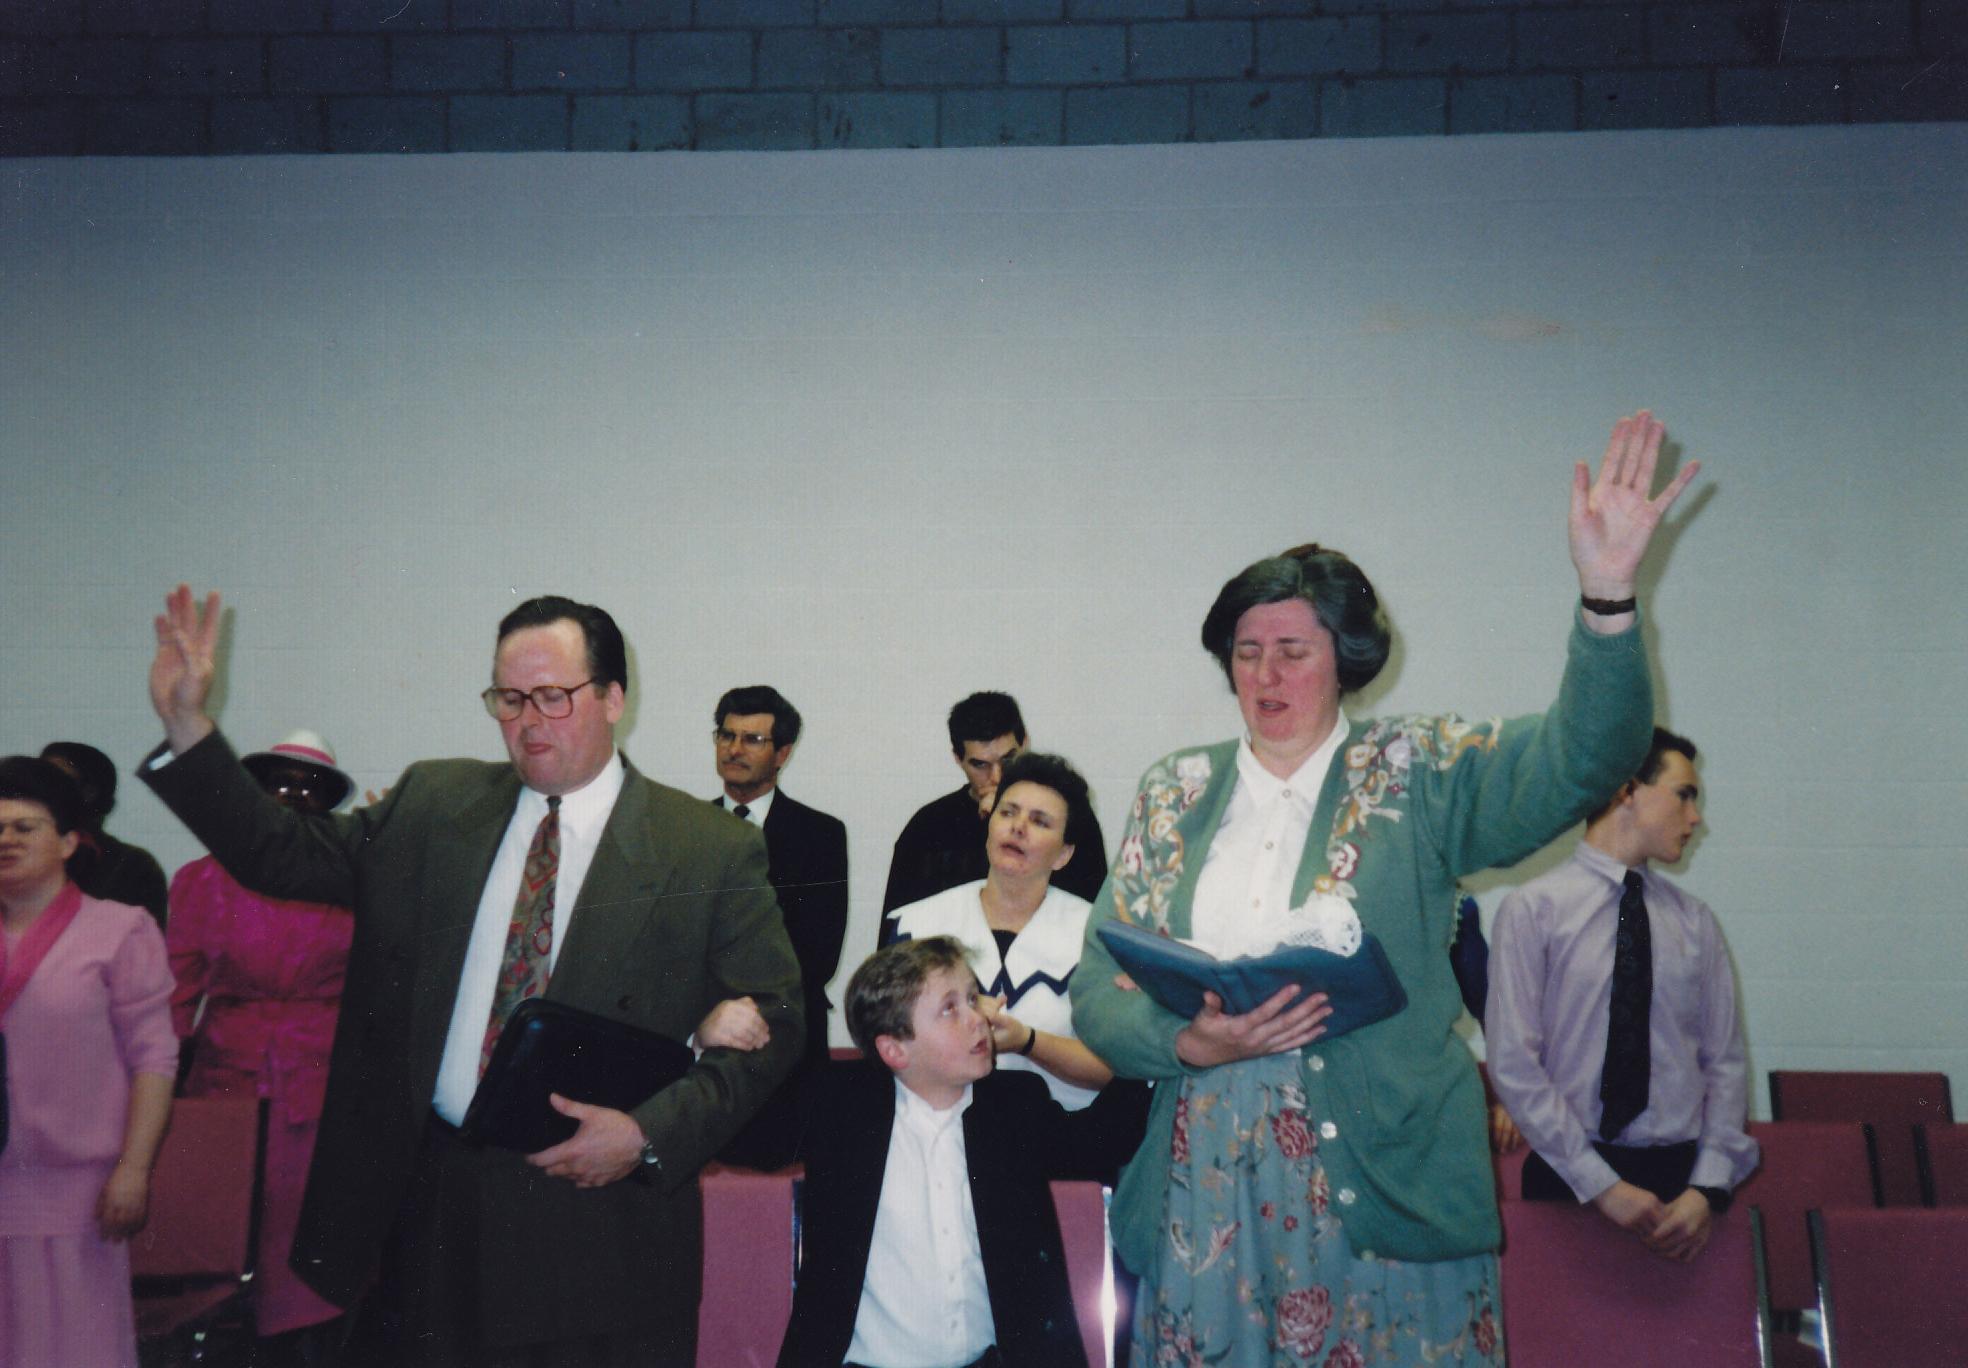 The Brysons installation service as Pastors of PLC - April 1992